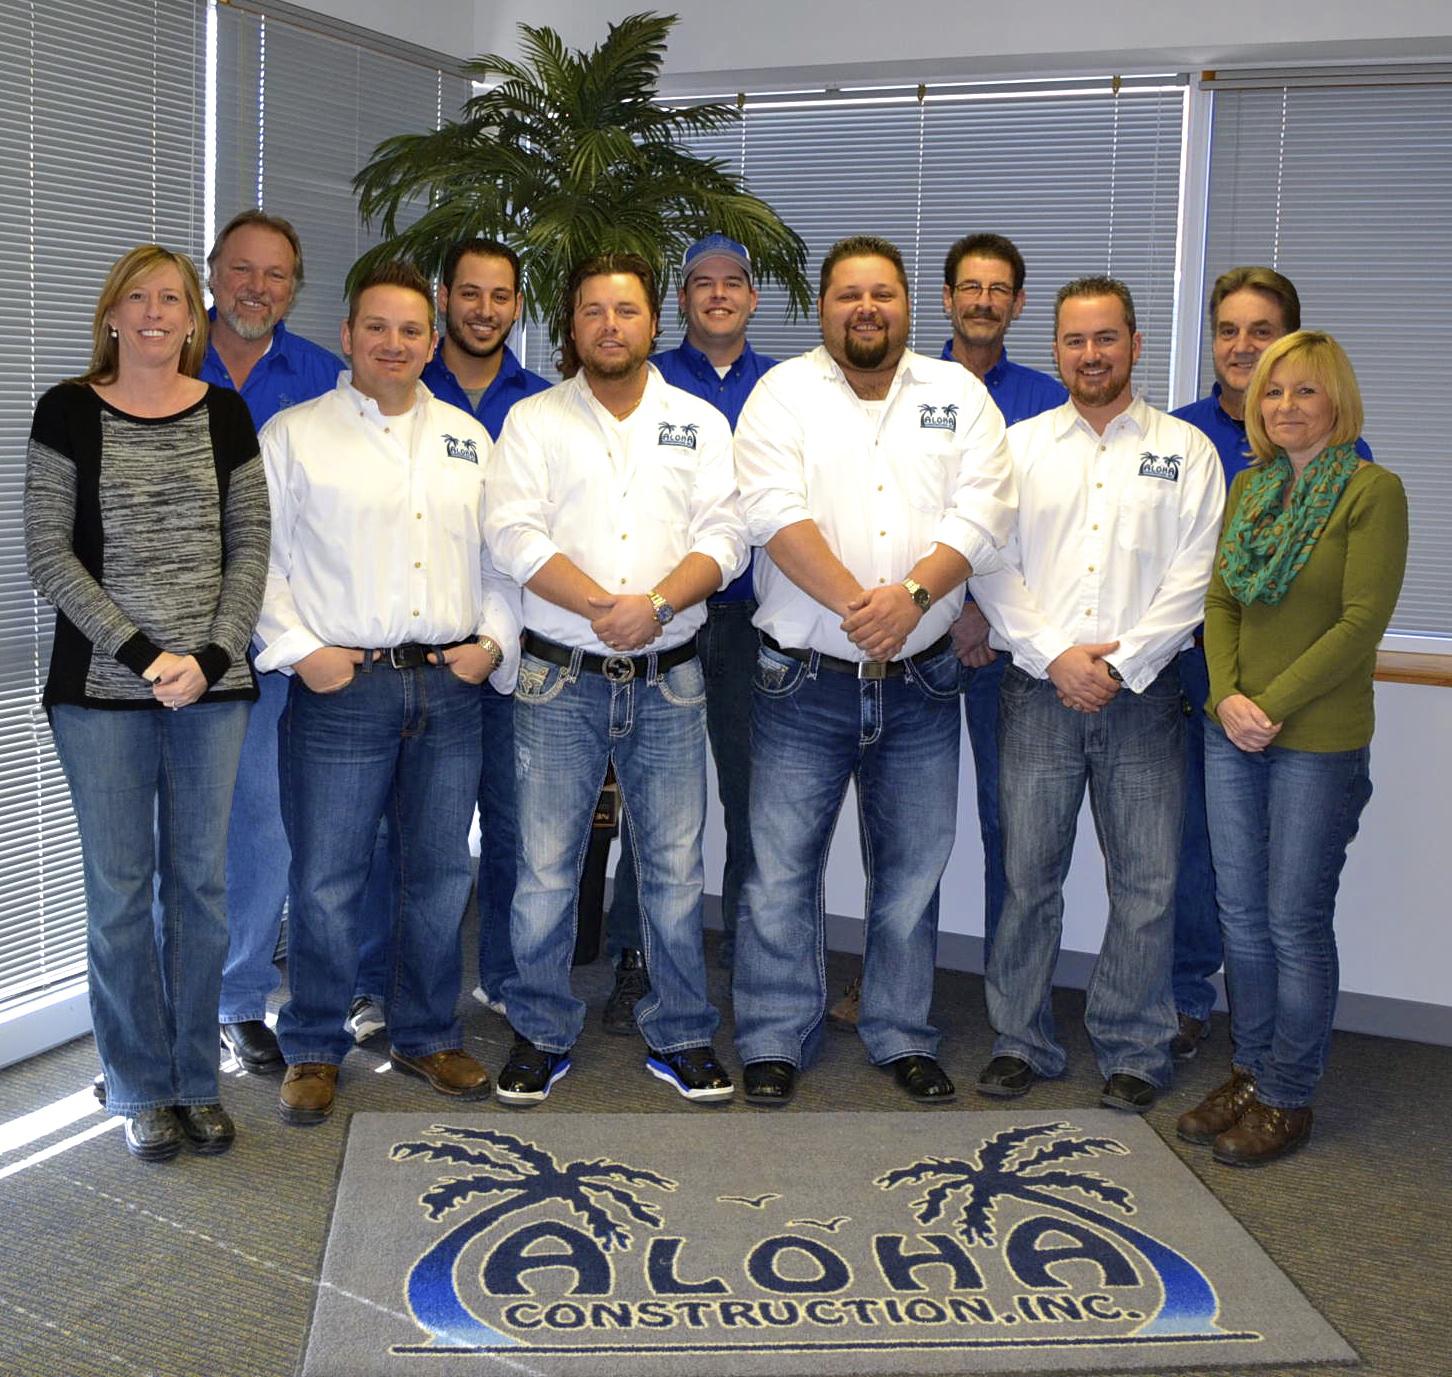 Aloha Construction Inc Celebrates Seven Years As Local